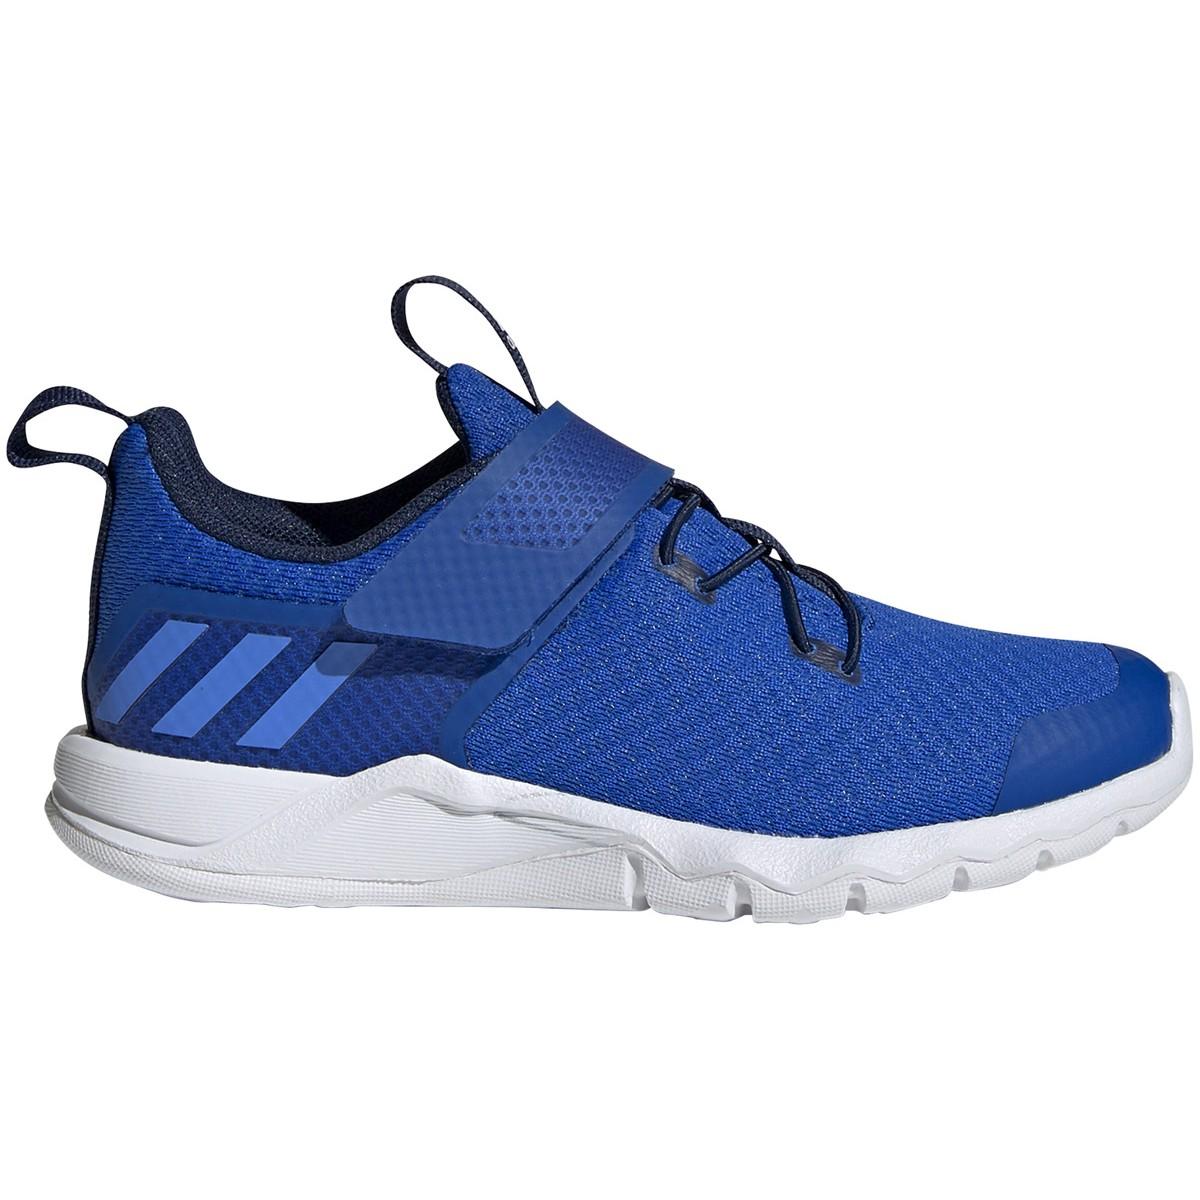 Chaussures Adidas Junior RapidaFlex Toutes Surfaces Bleues